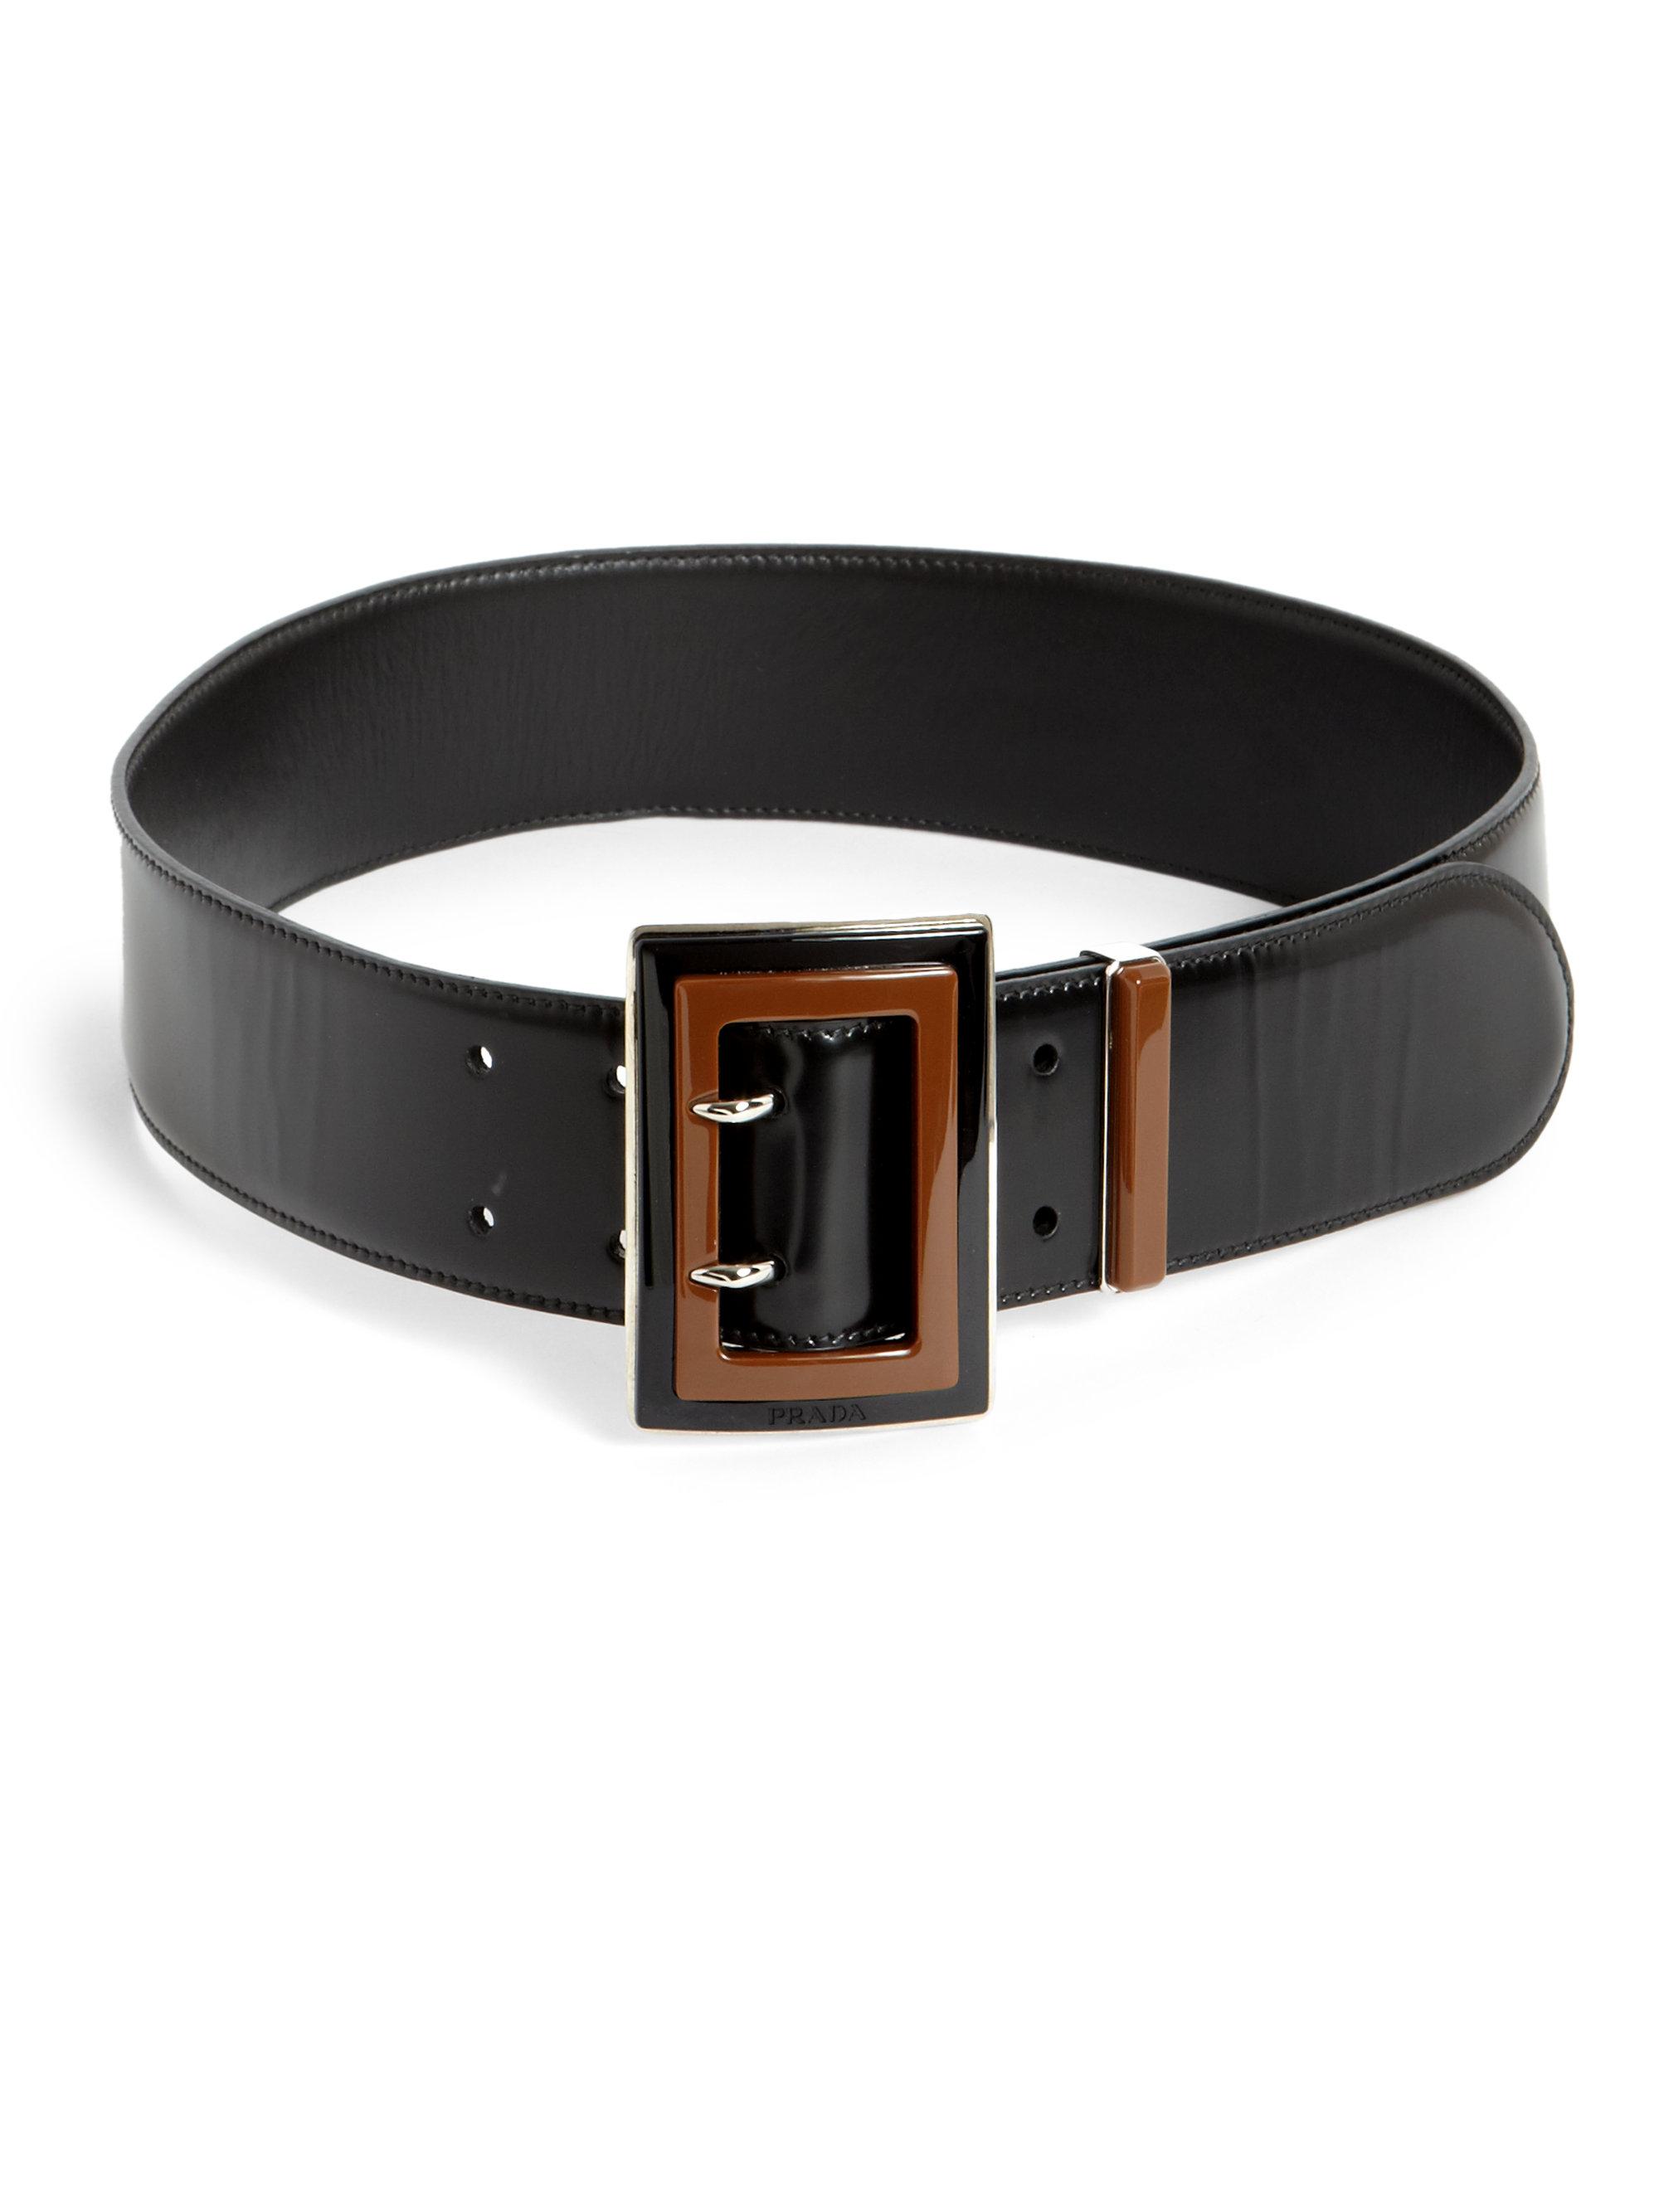 Prada Cinture Patent Leather Belt in Black (BLACK-BROWN) | Lyst